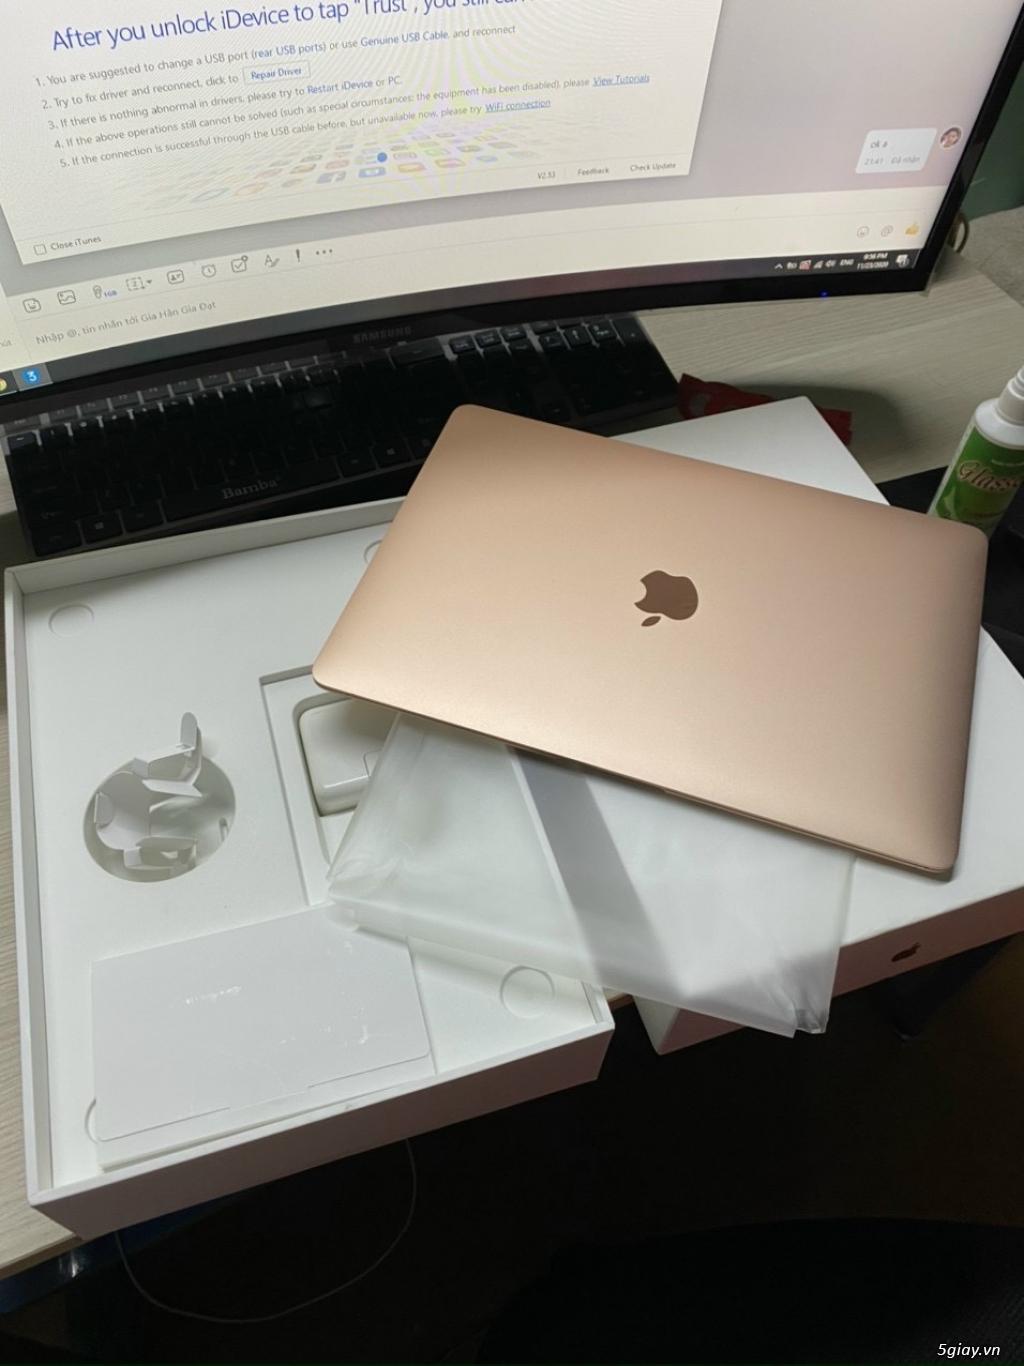 MacBook Air 13 inch 2018 màu gold fullbox đẹp keng 99% - 1